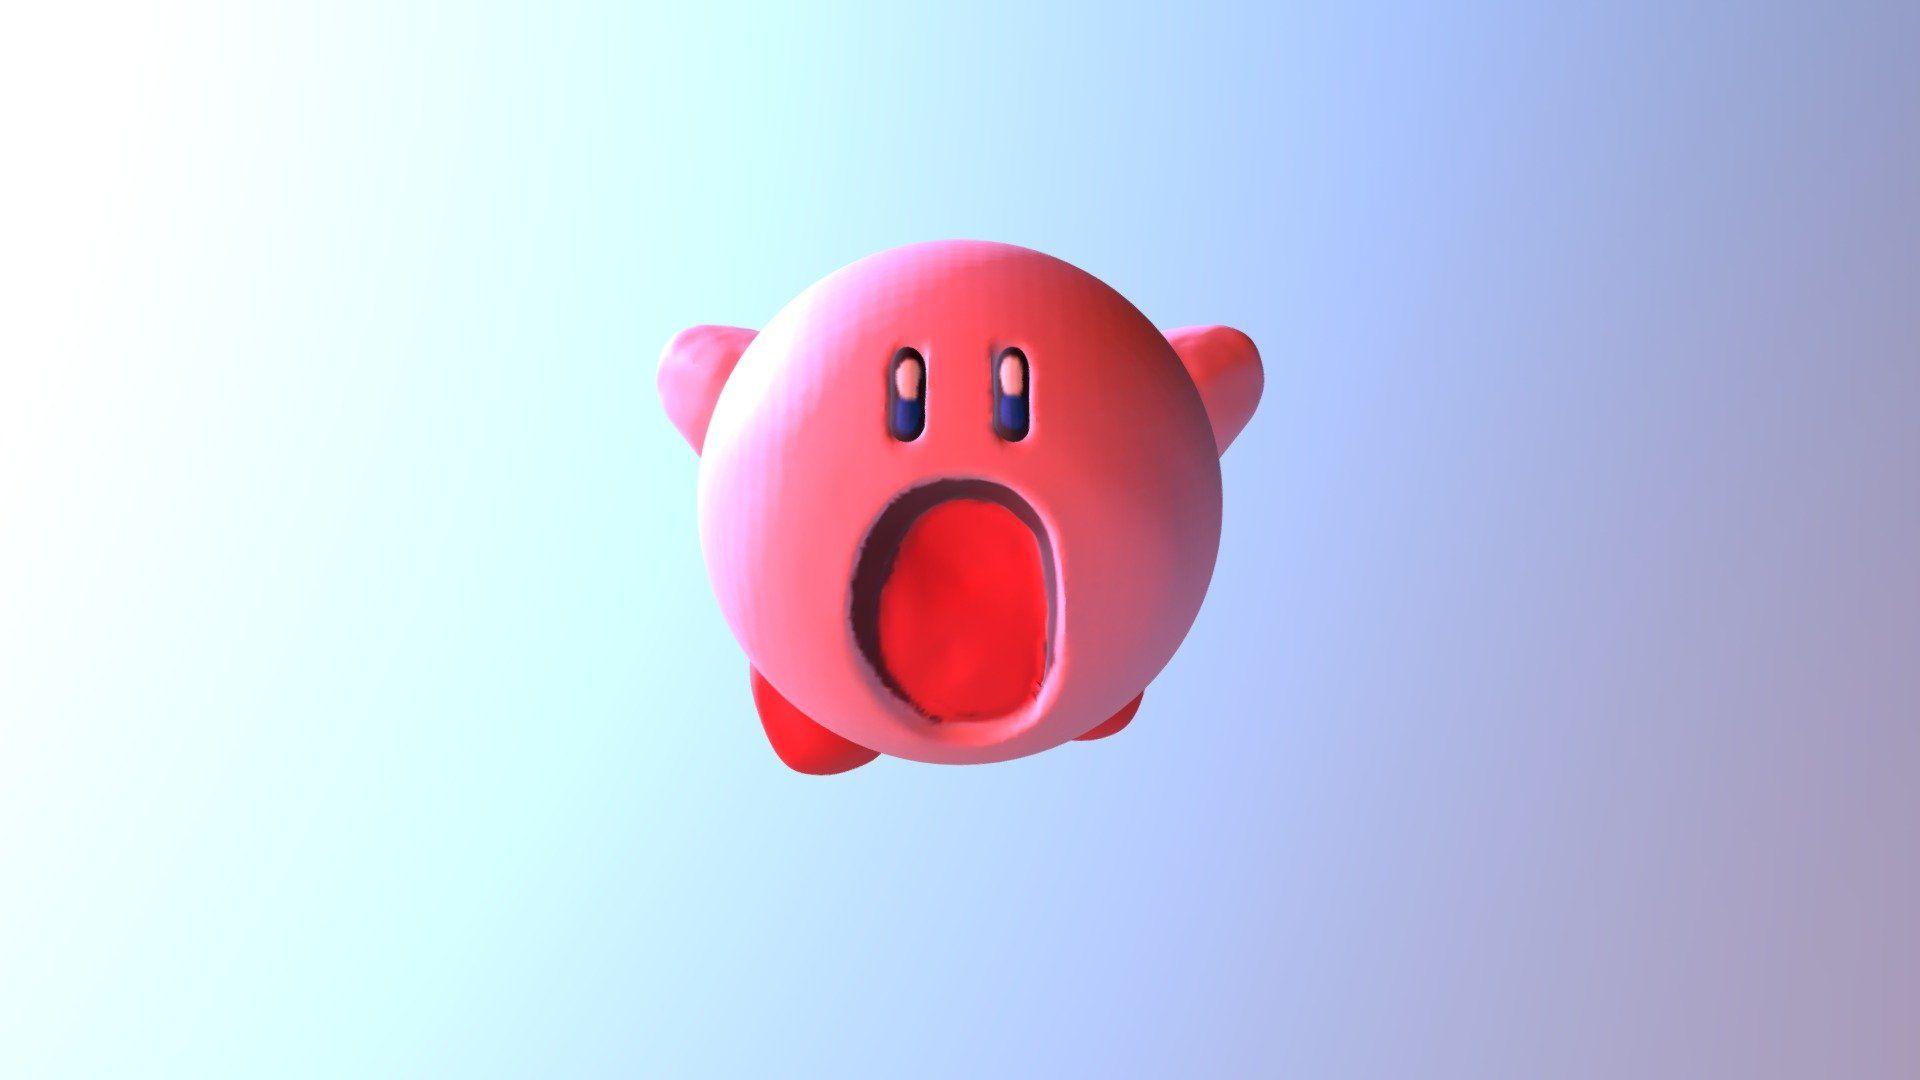 Kirby wallpaper photo hd